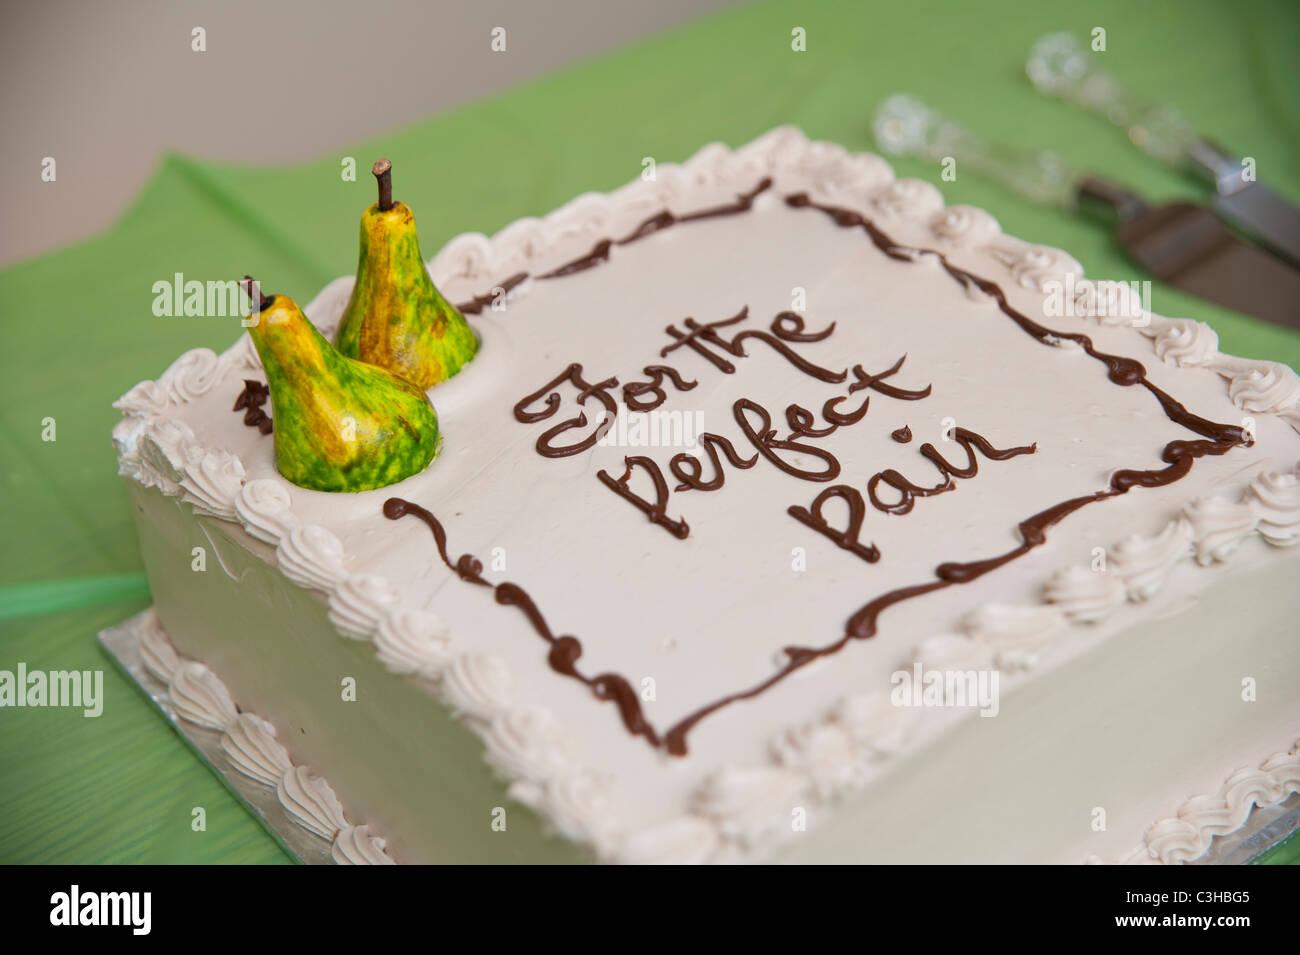 Celebratory Pear Themed Cake Stock Photo 36646965 Alamy